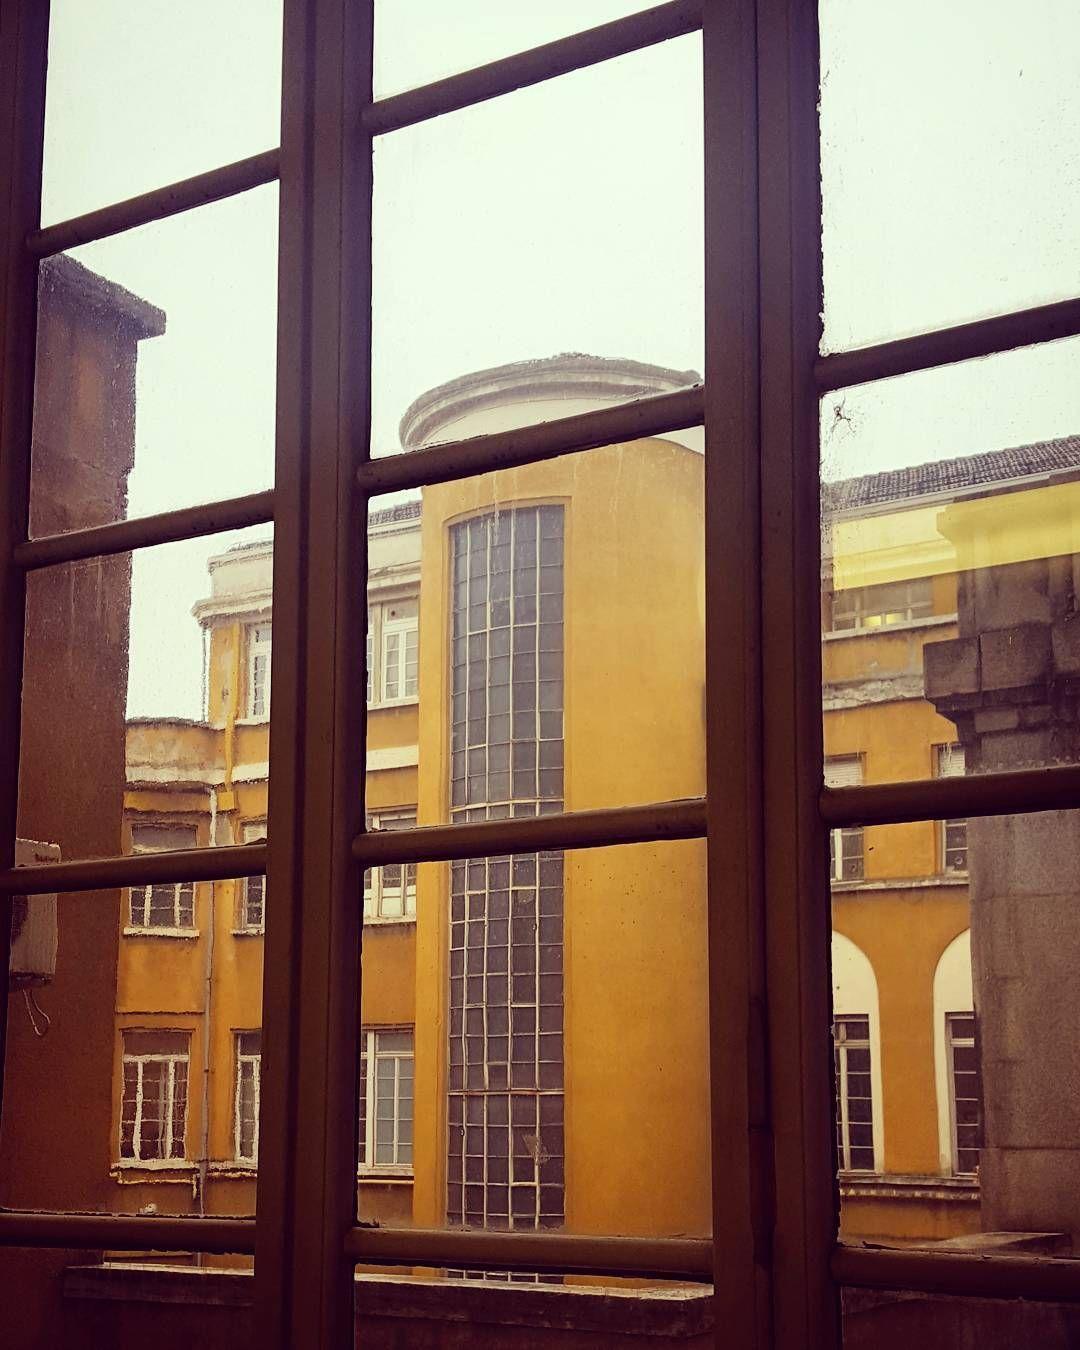 #Torino #Turin #viadellaConsolata #seemycity #igerstorino #rationalism #window #winter